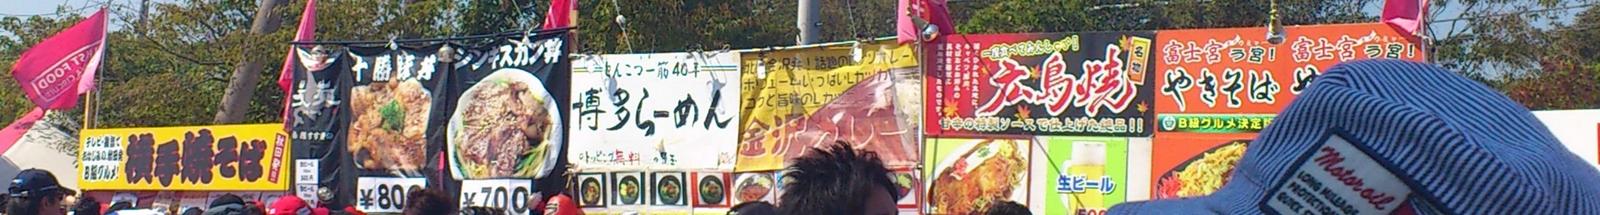 20111009suzuka